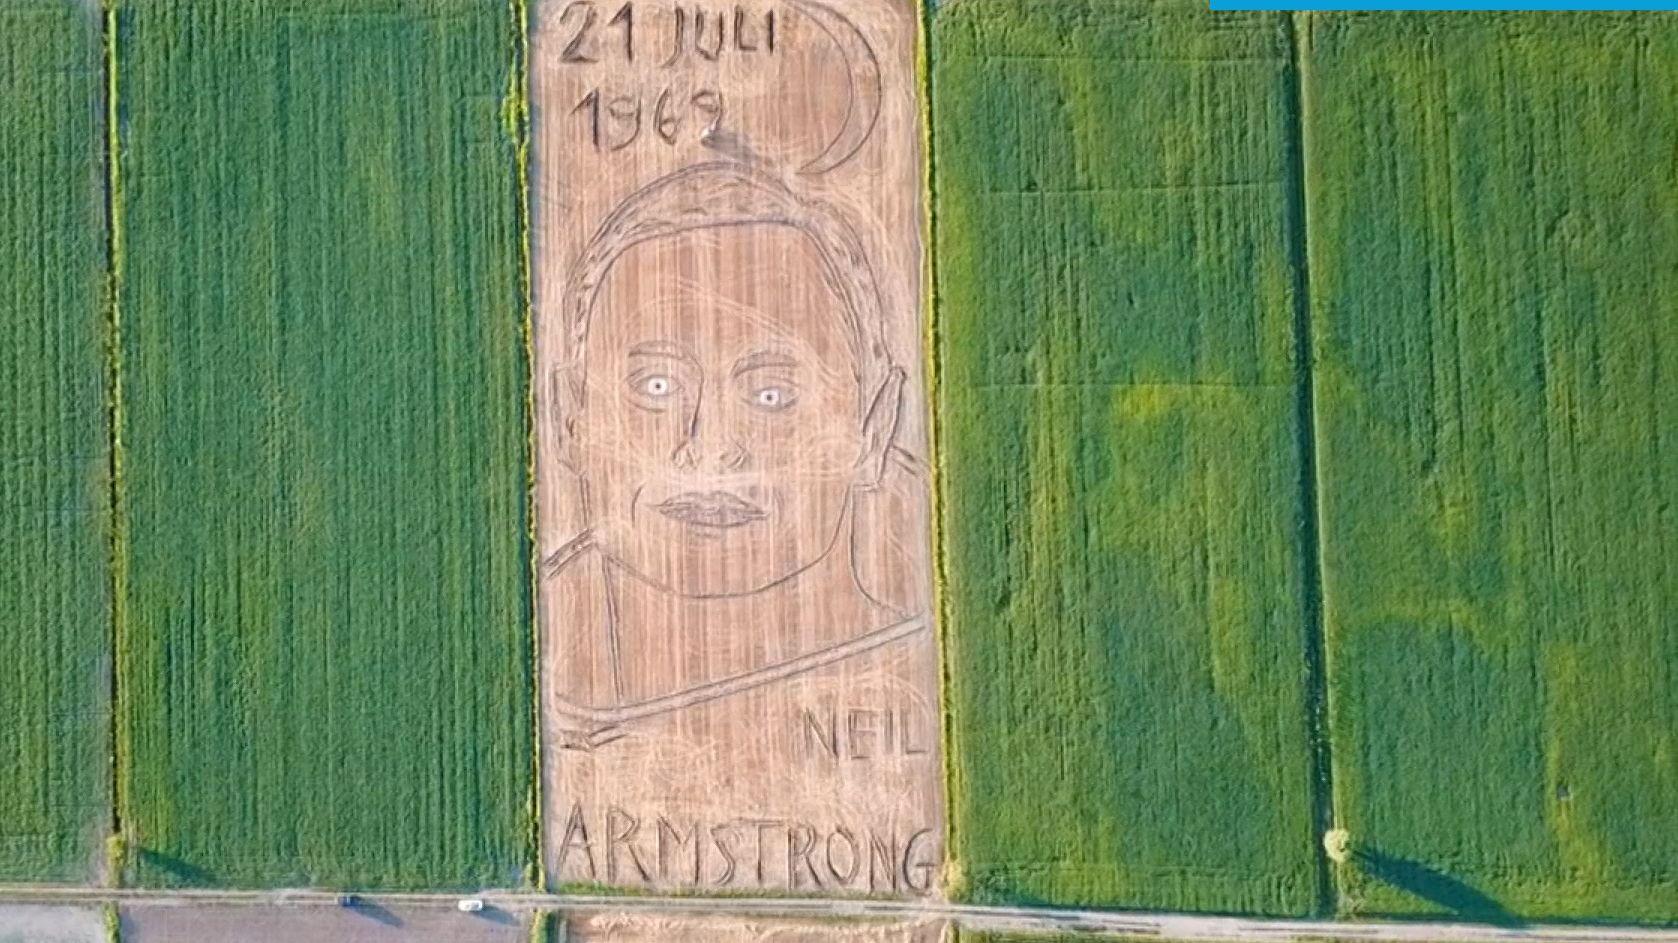 Armstrong-Portrait in italienischem Feld